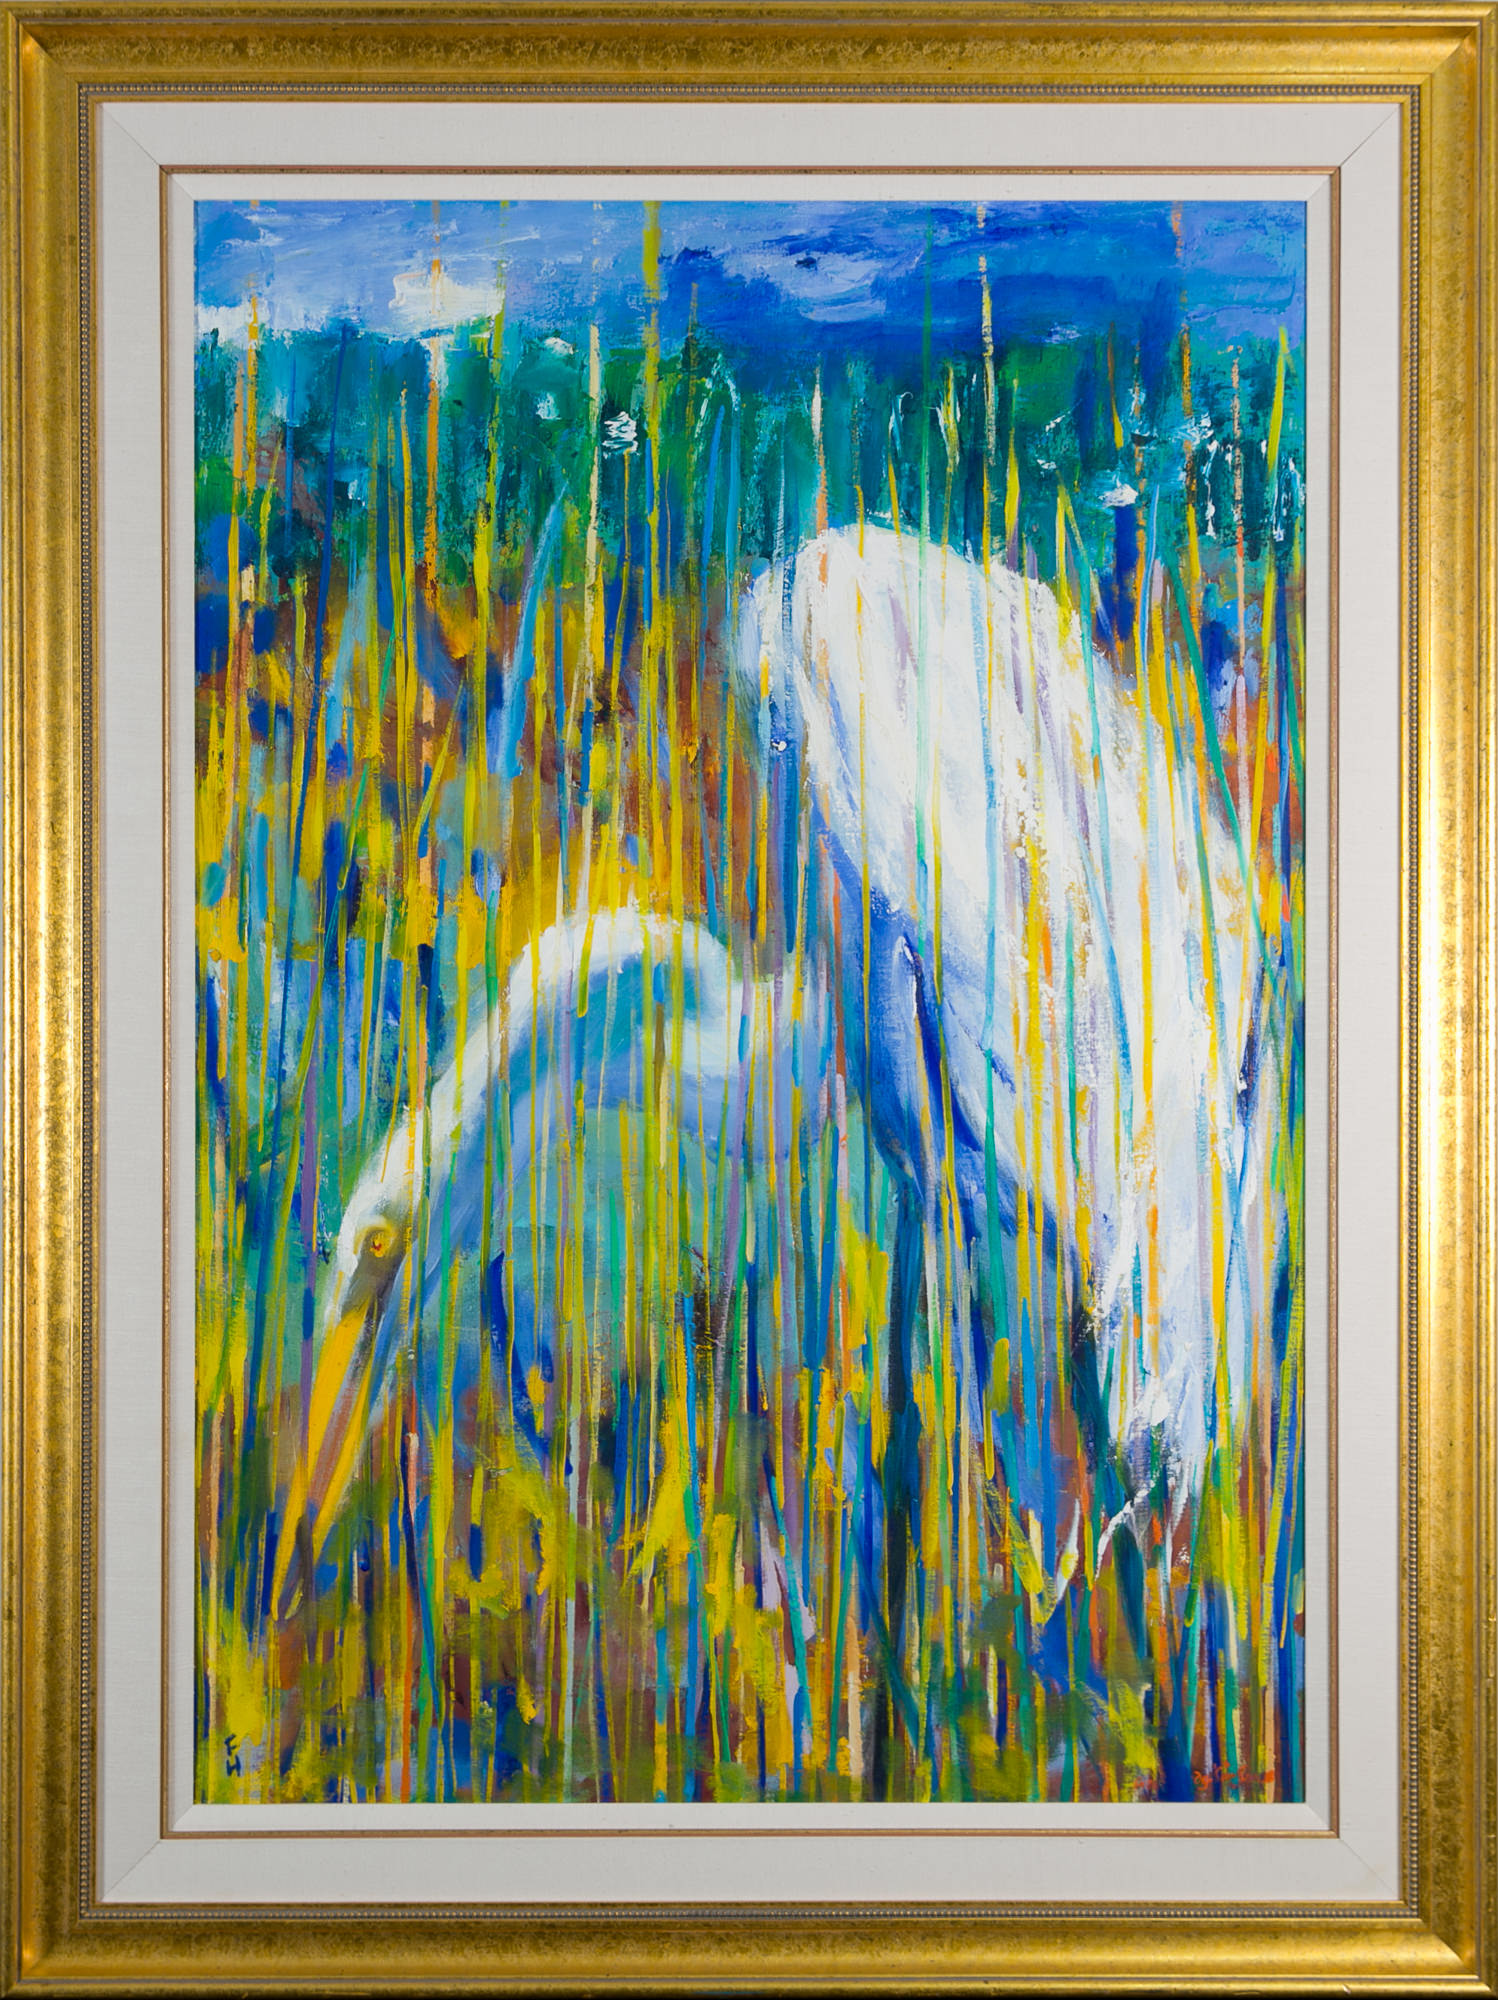 'Frank Hodgkinson (1919-2001) Great Egret 1993, Oil on Linen Board'